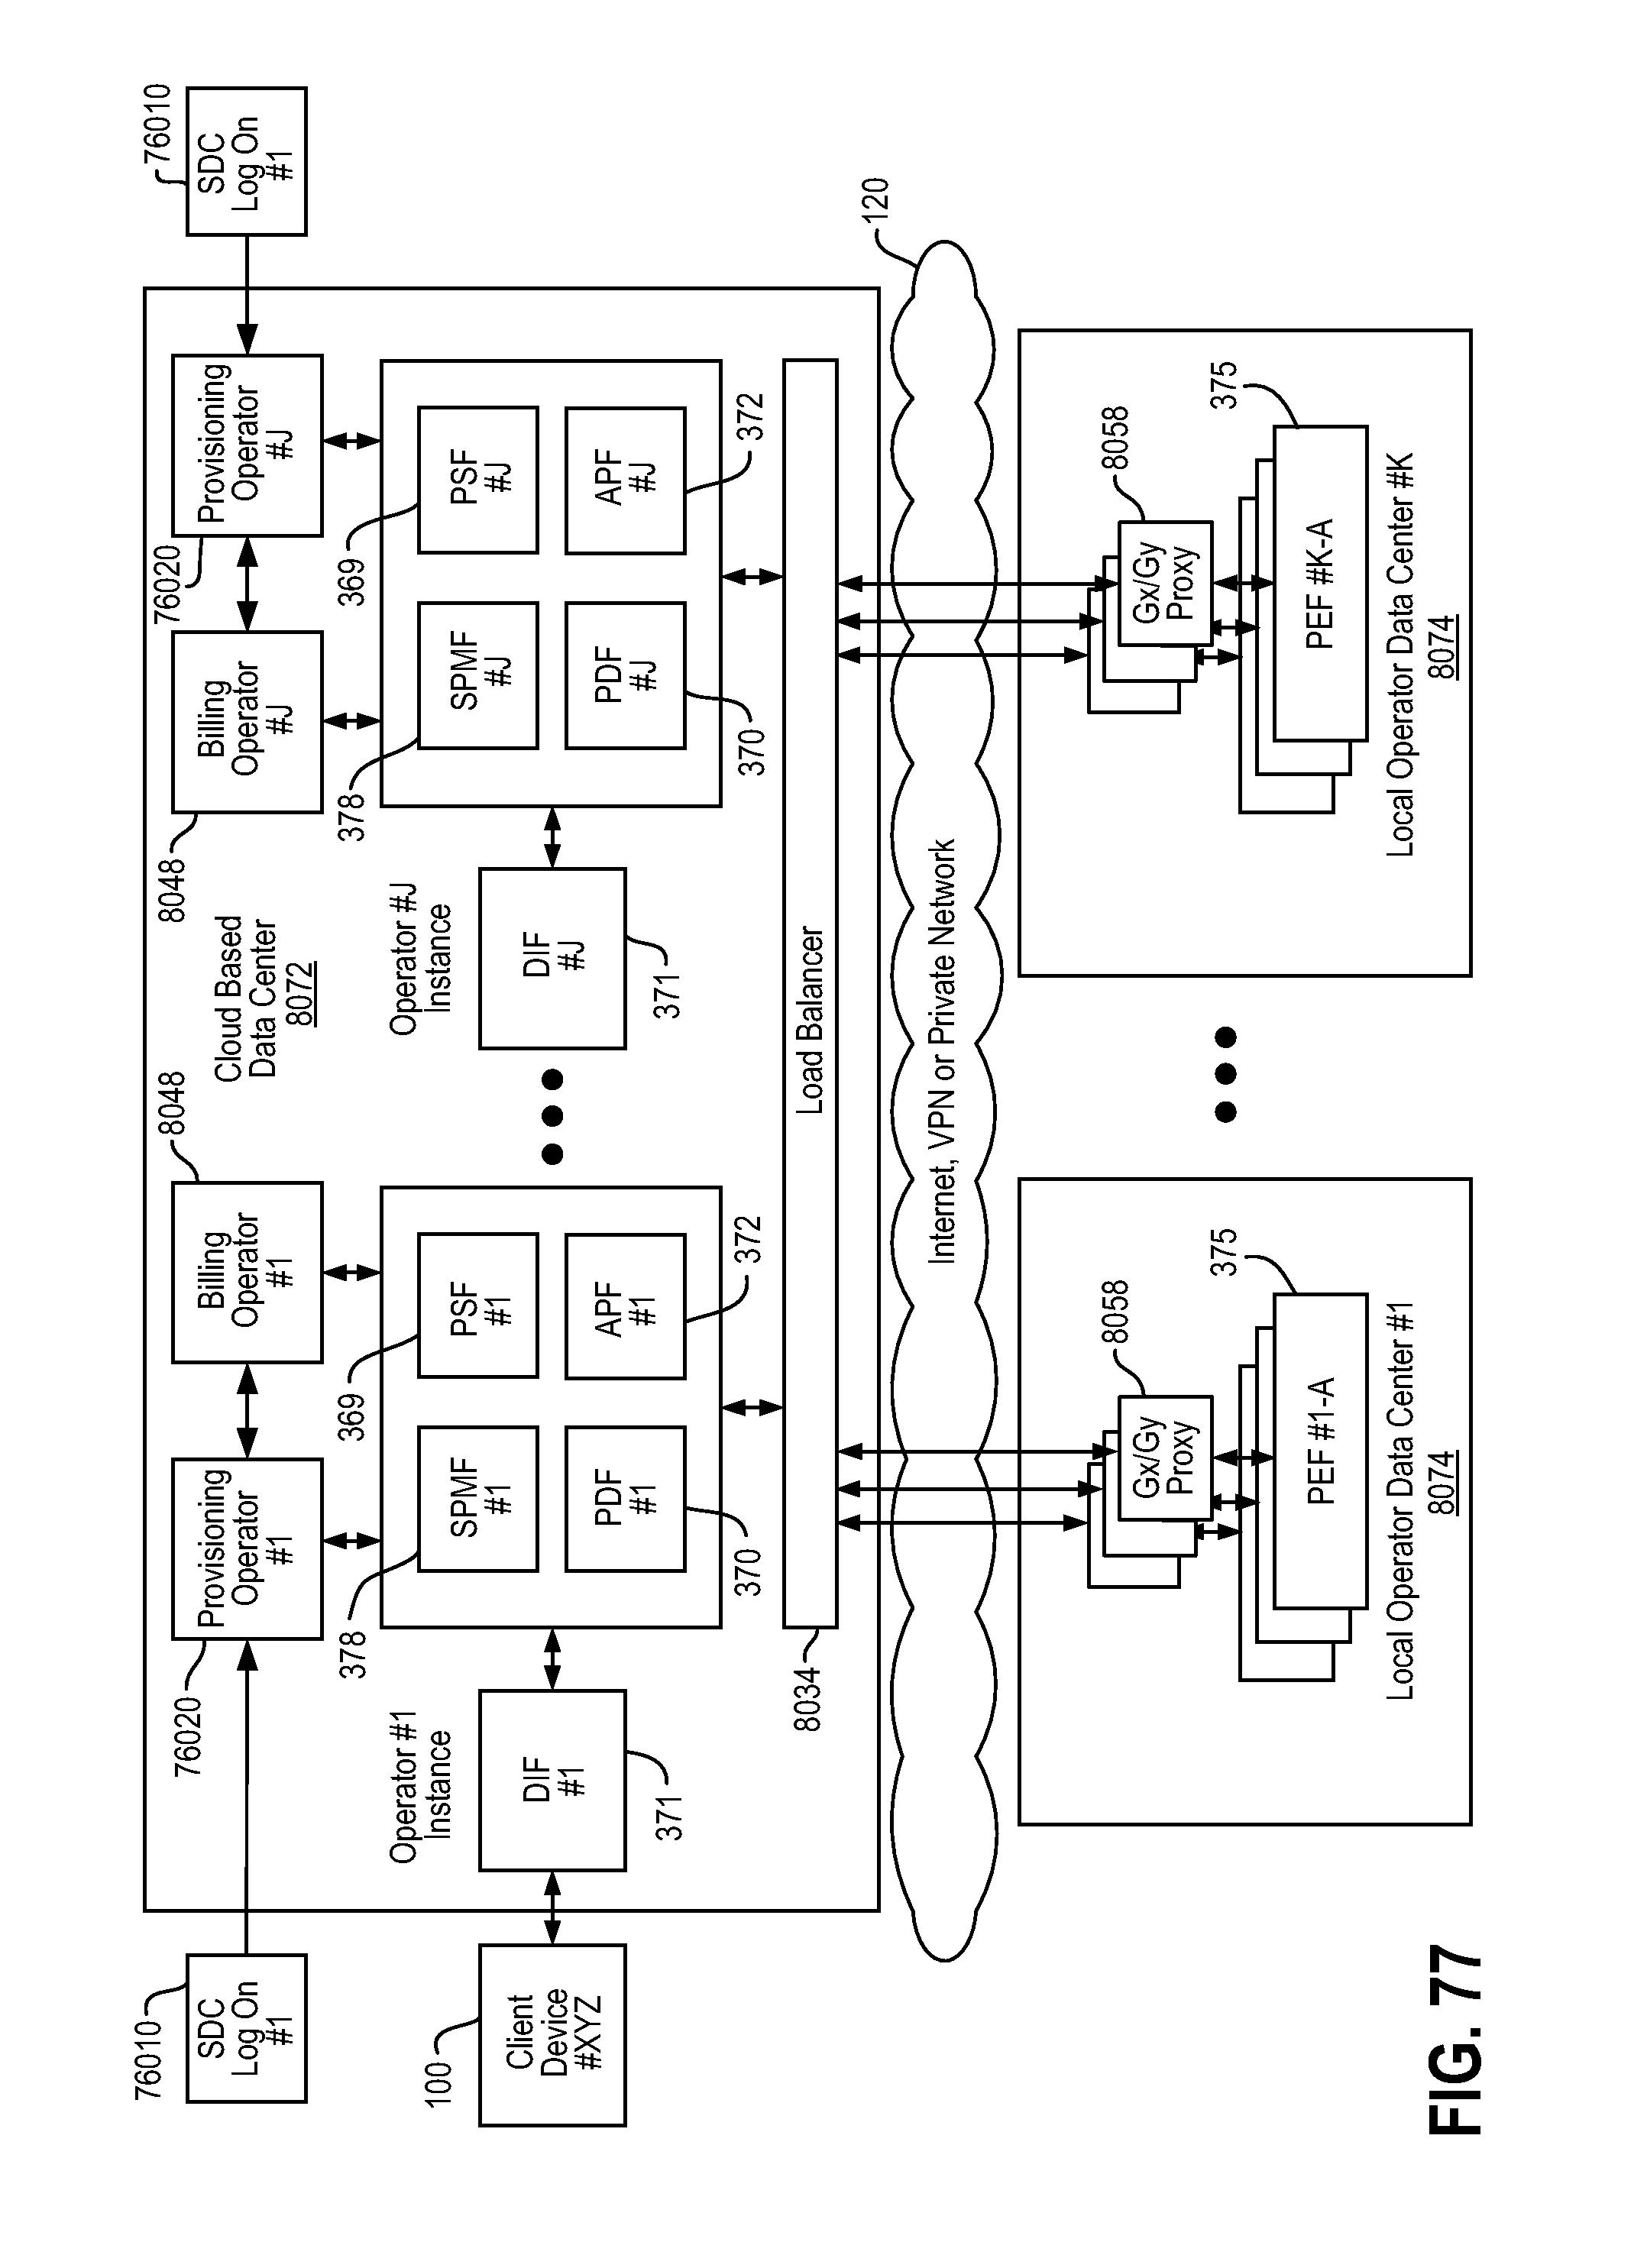 Patent Us 10057775 B2 Contigo Gps Wiring Diagram